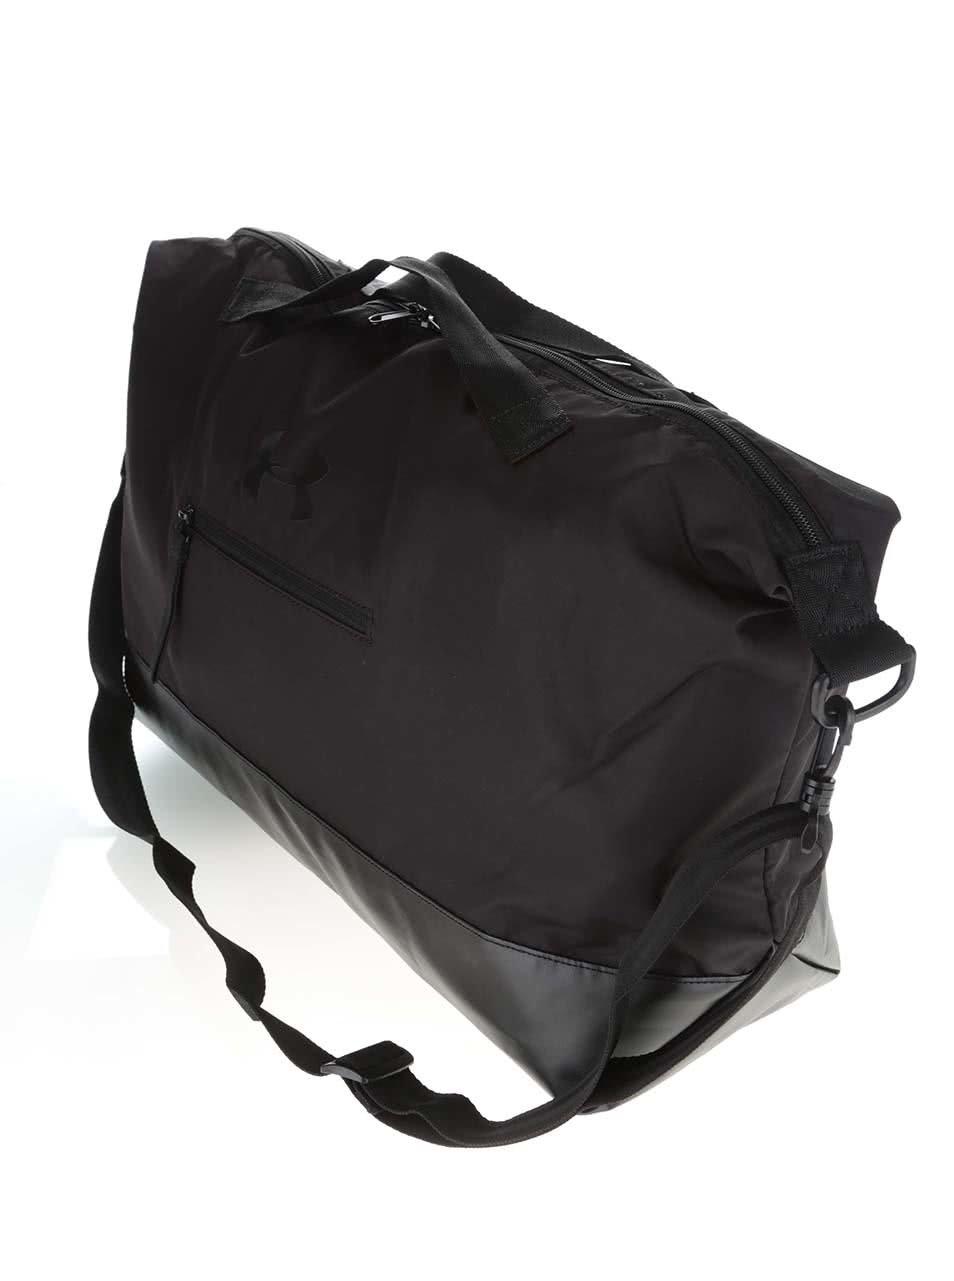 Čierna unisex športová taška Under Armour On The Run Weekender ... de0bbf56b4e